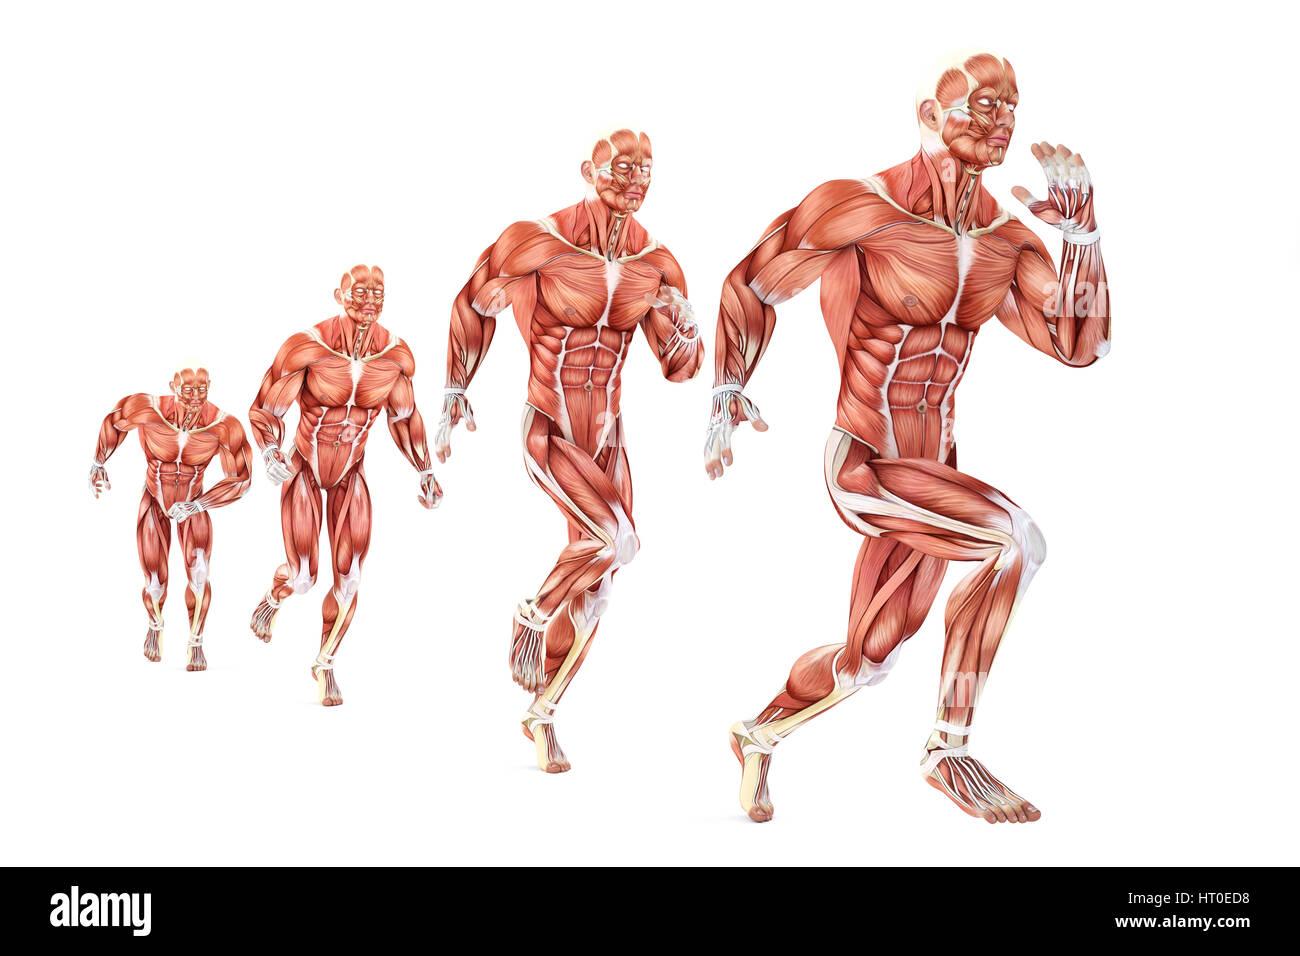 Running Man Anatomy Medical Illustration Isolated Over White Stock